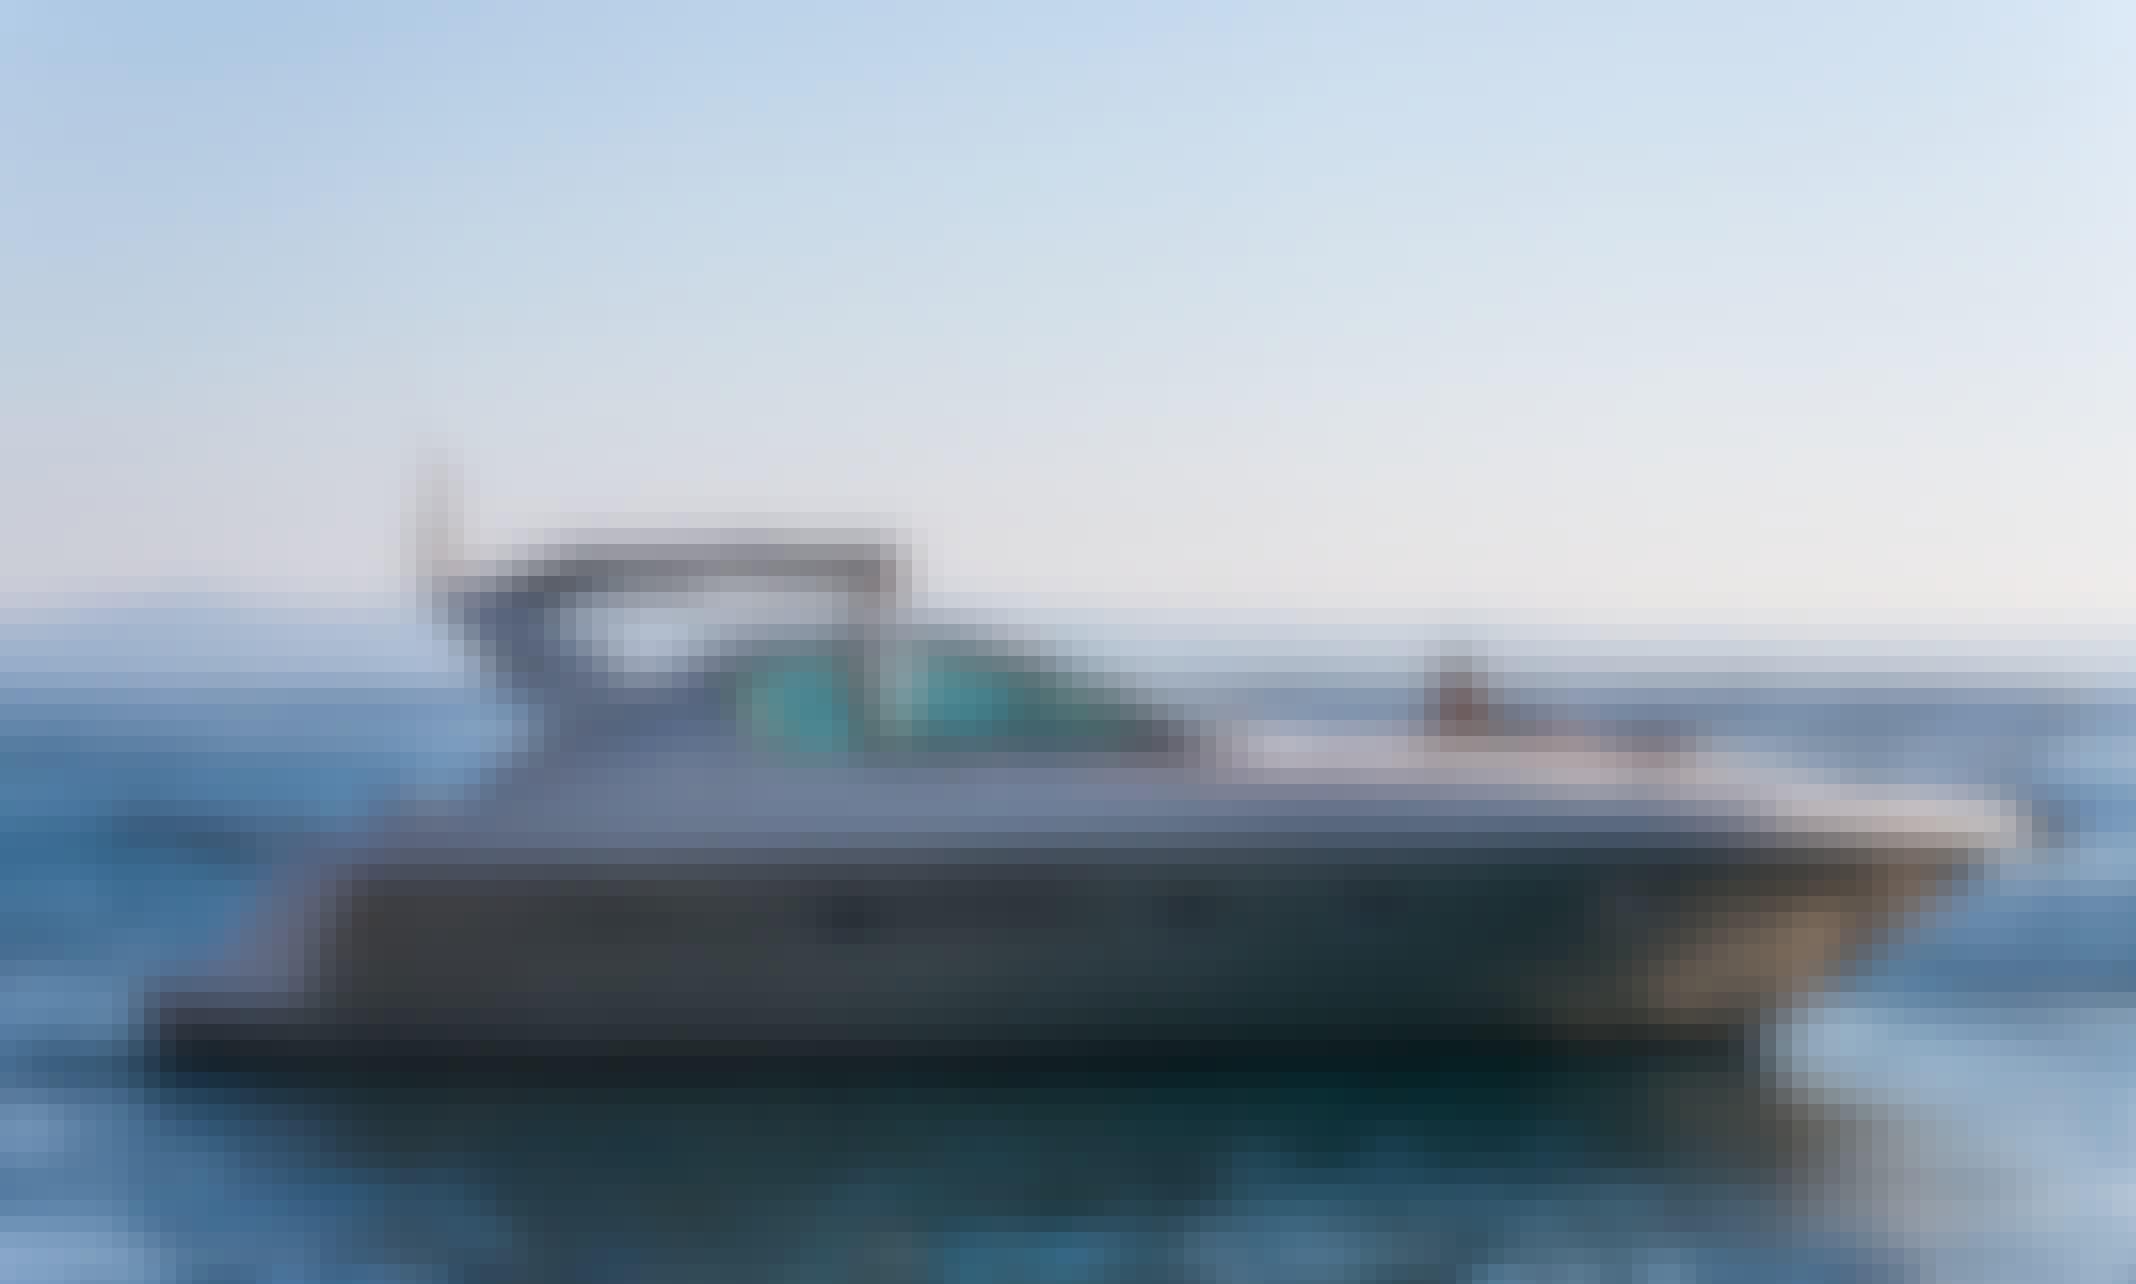 Motor Yacht Charter - Pearlsea 36 Open - in Baška Voda, Split, Dalmatia